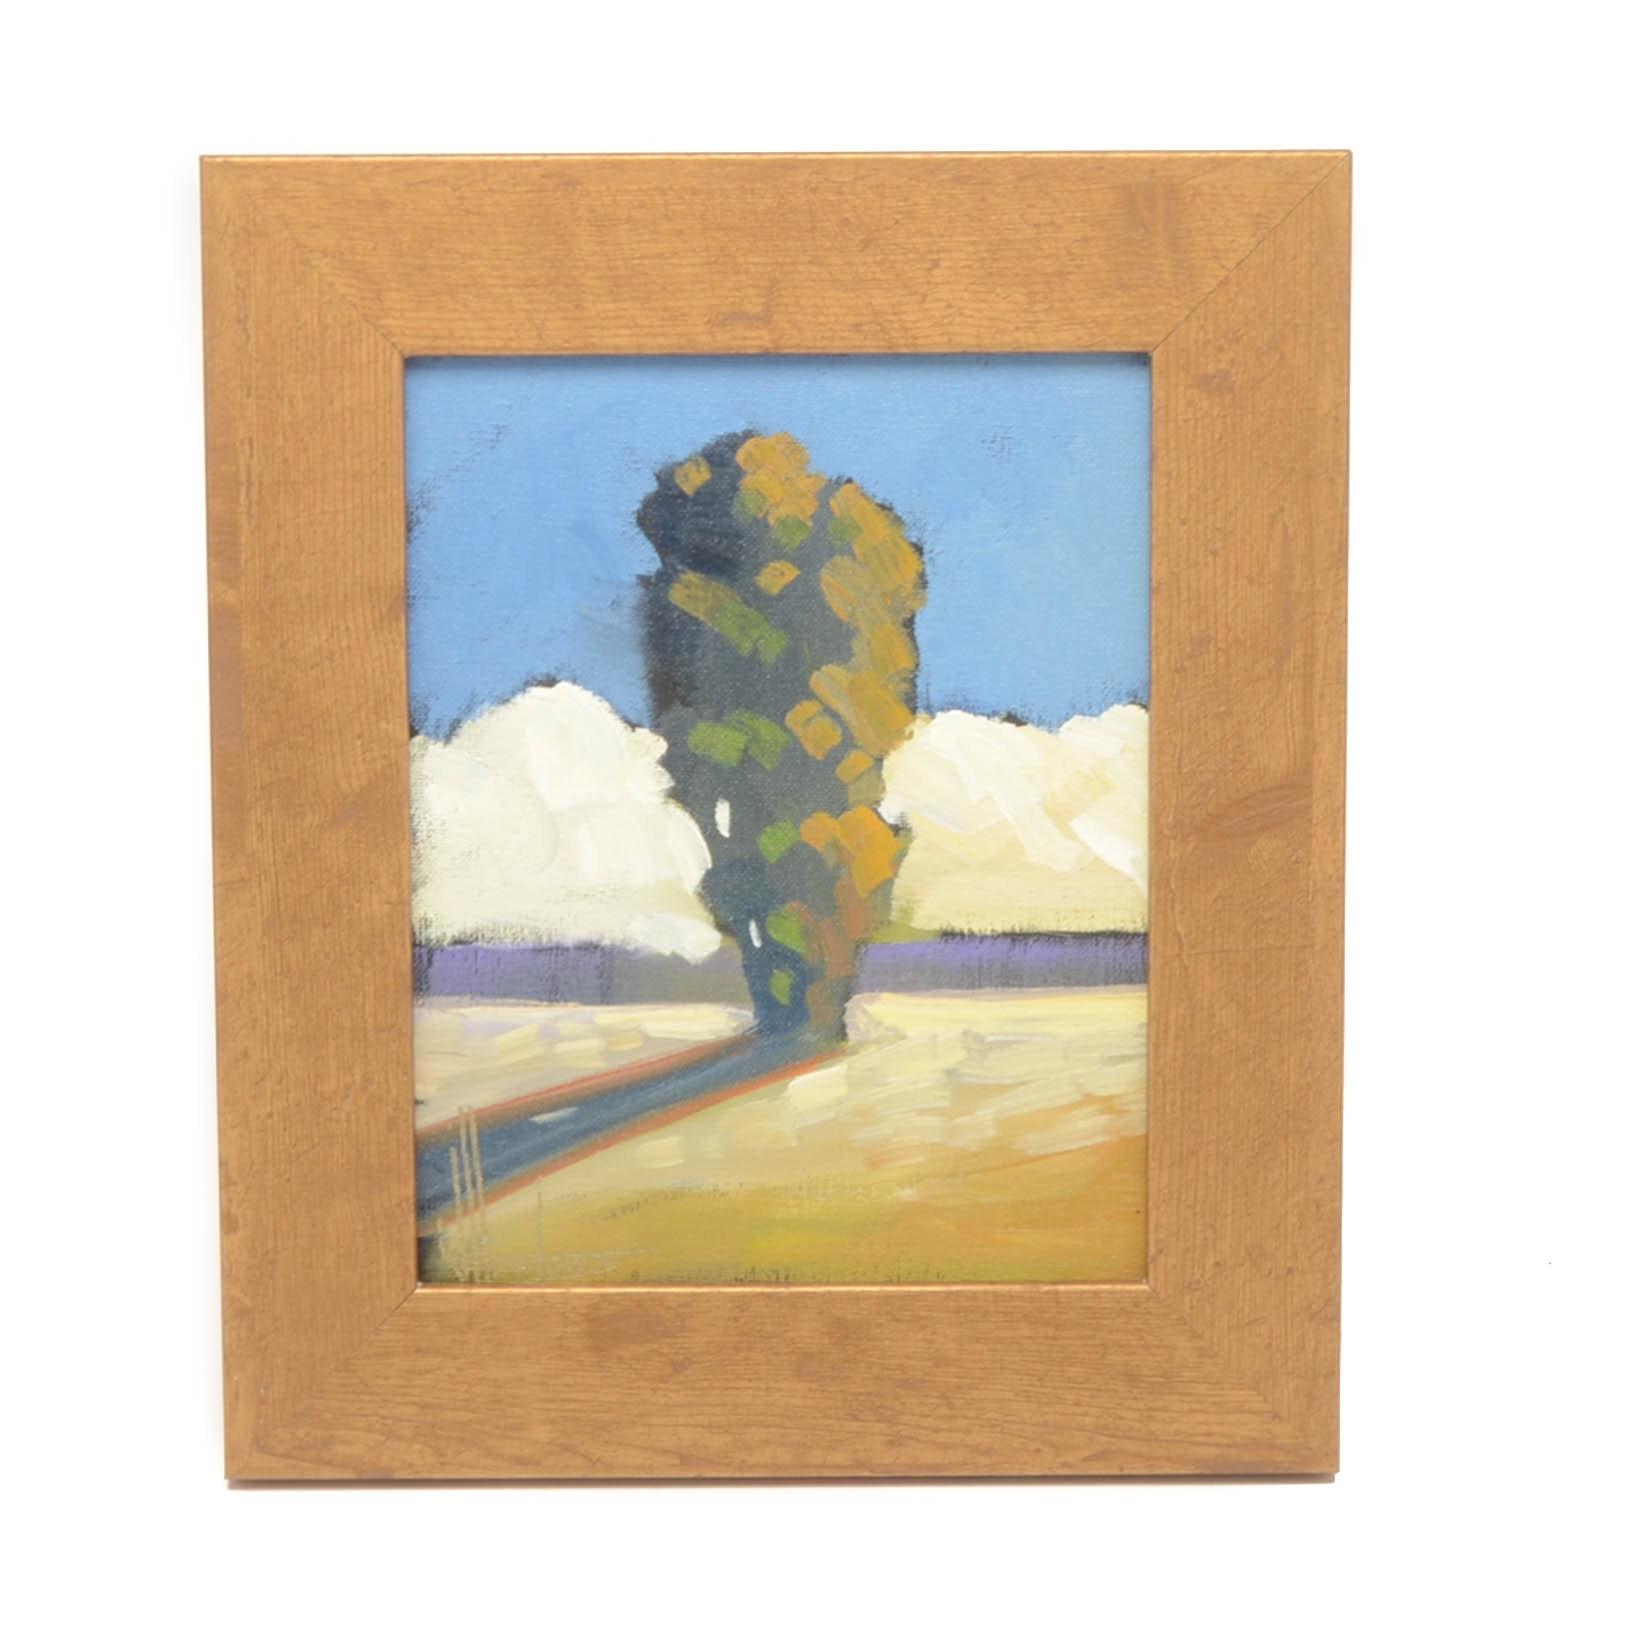 William Hawkins Original Oil on Canvas Board Landscape